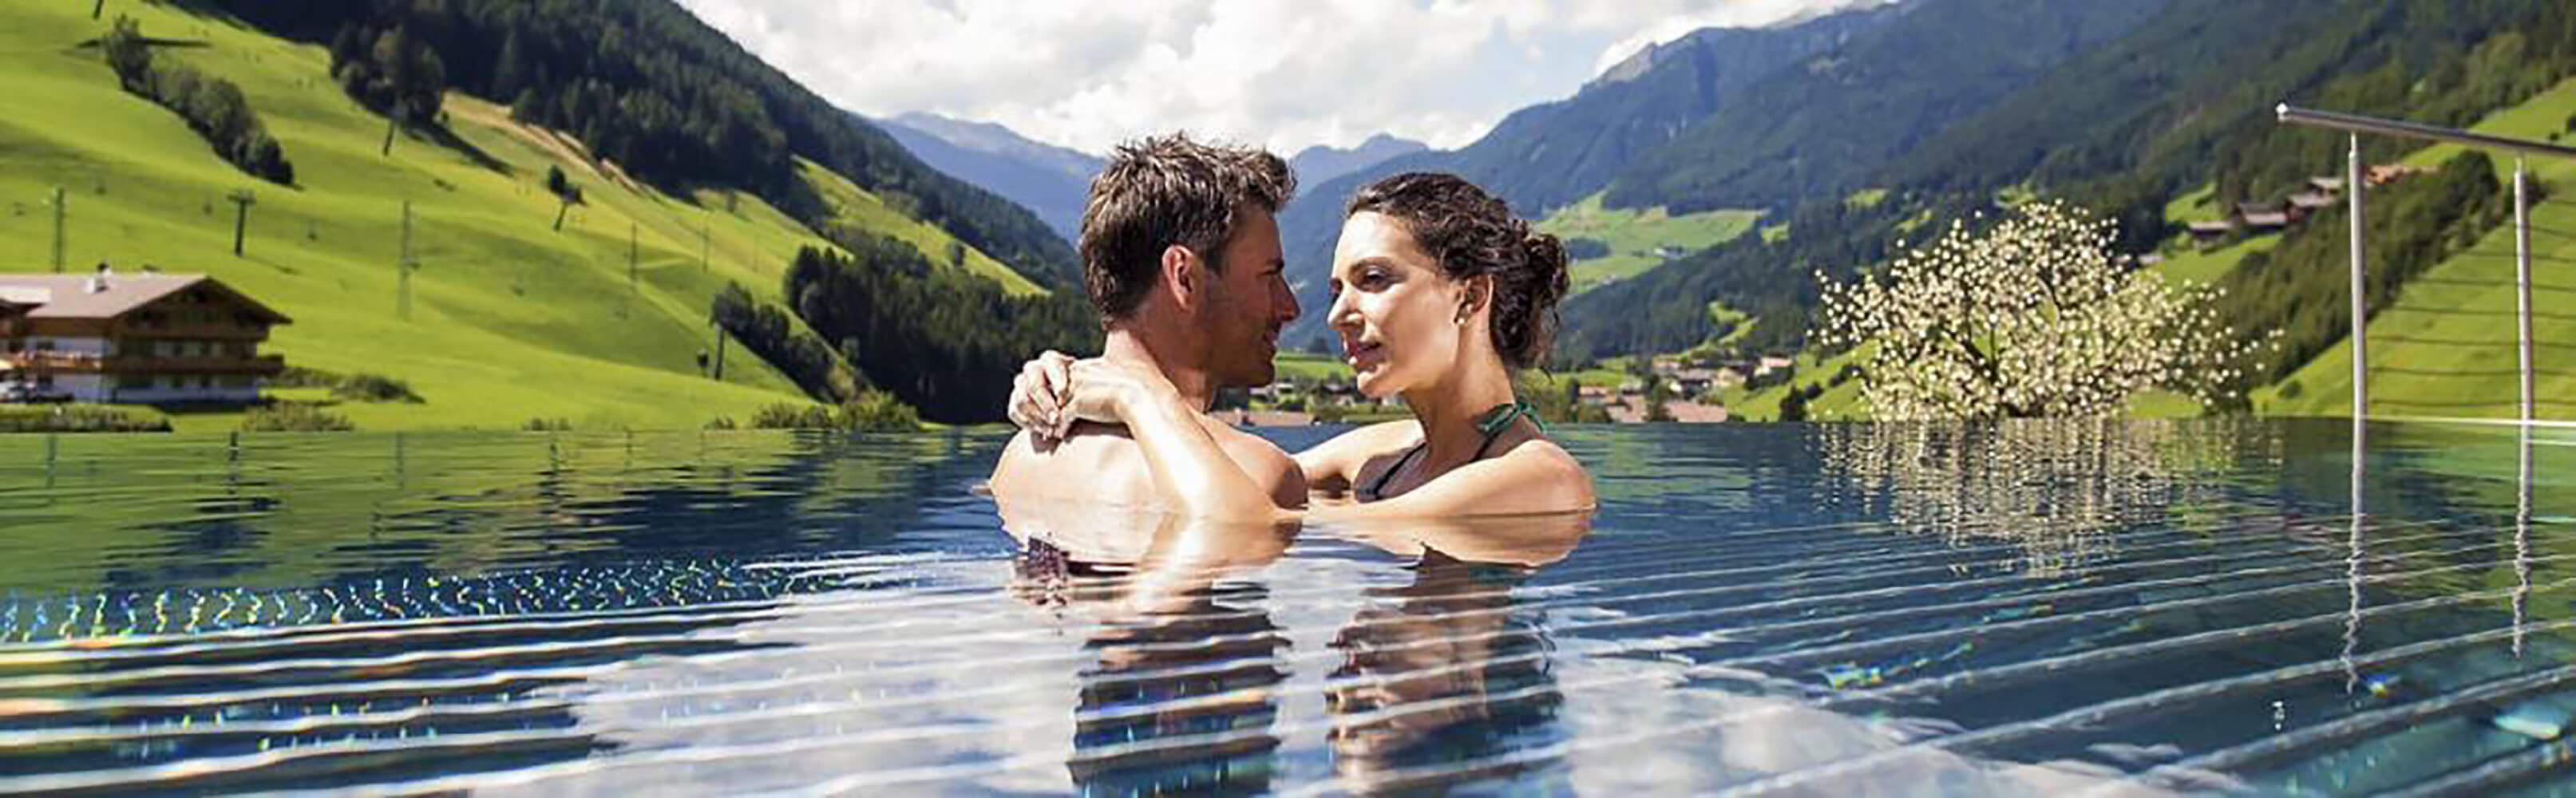 SwissWellness - Wellness-Weekend & einfach geniessen! 1